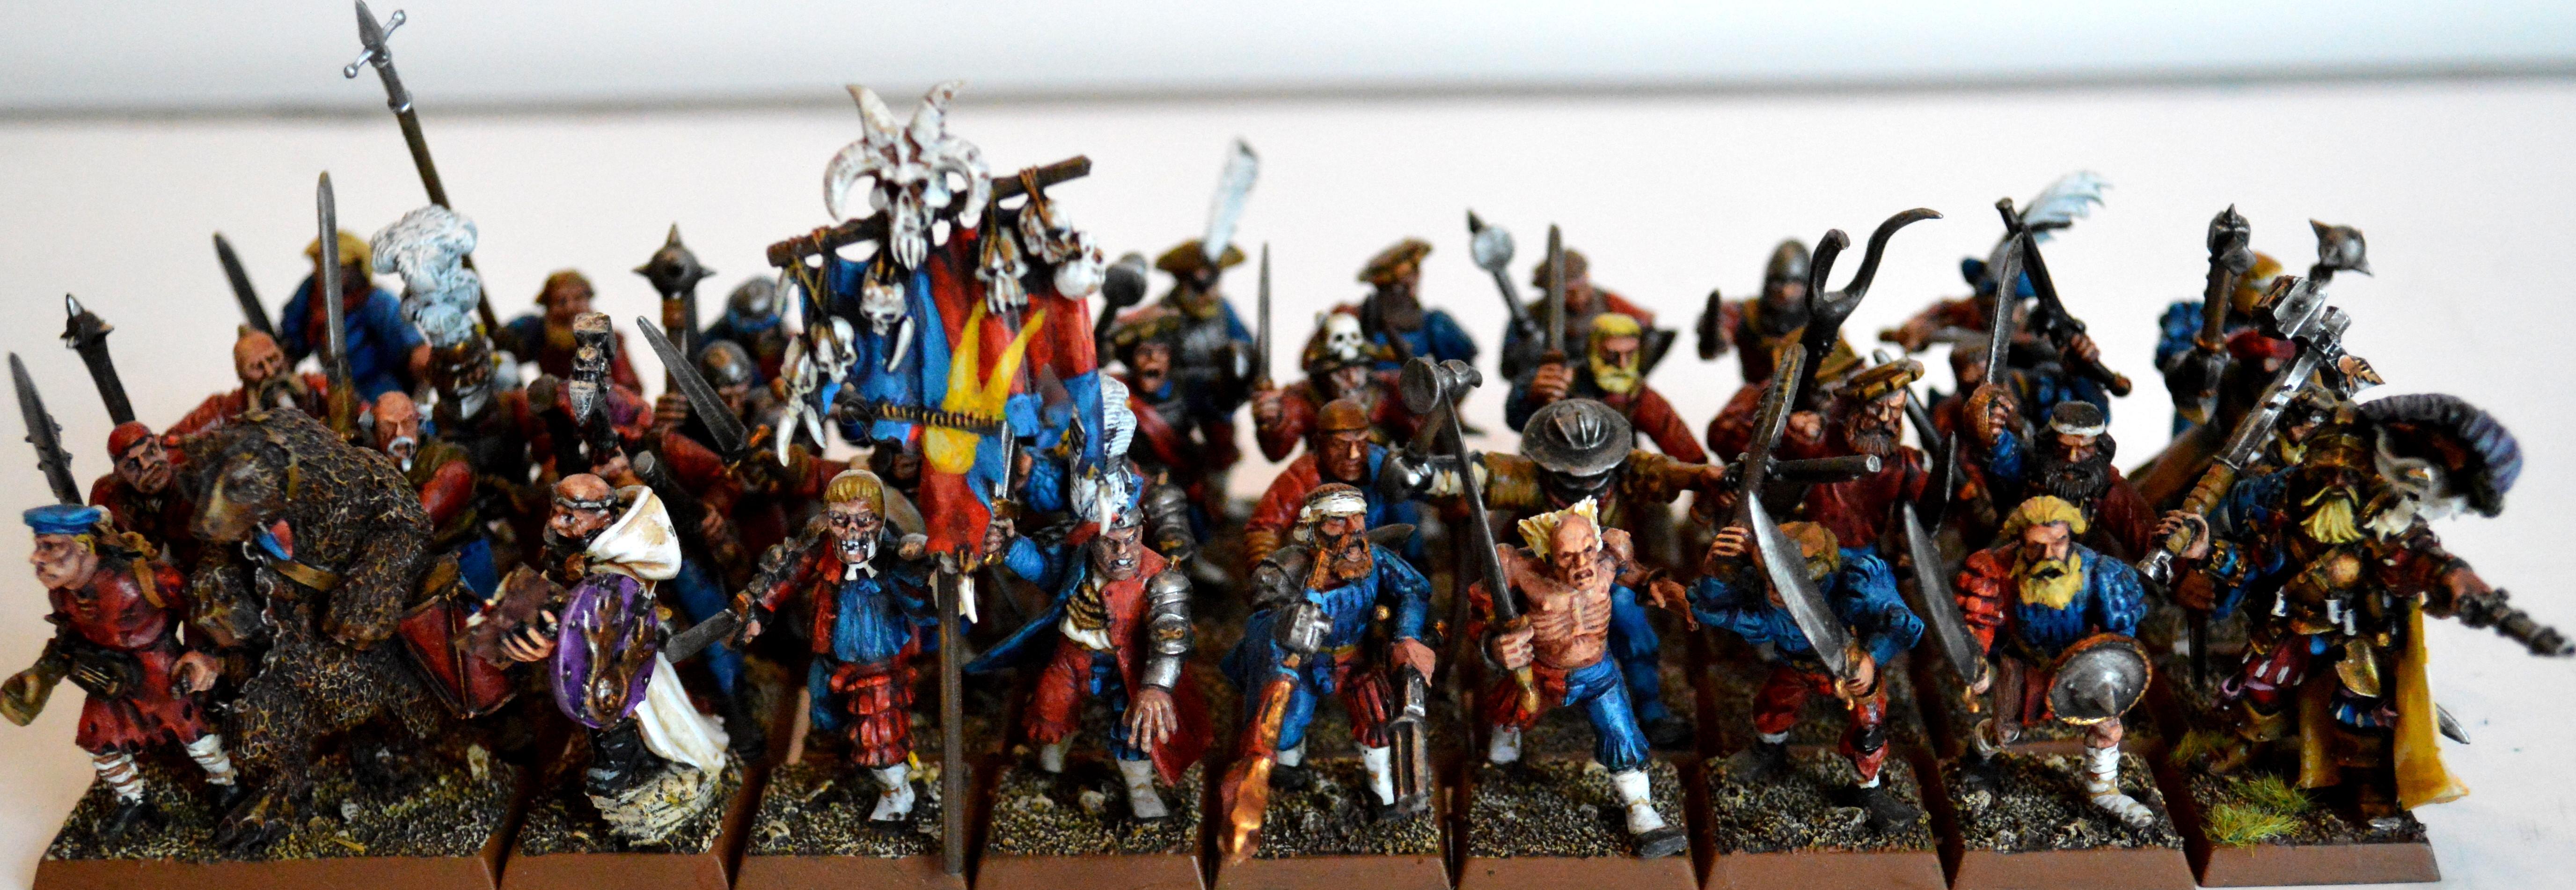 Empire, Warhammer Fantasy